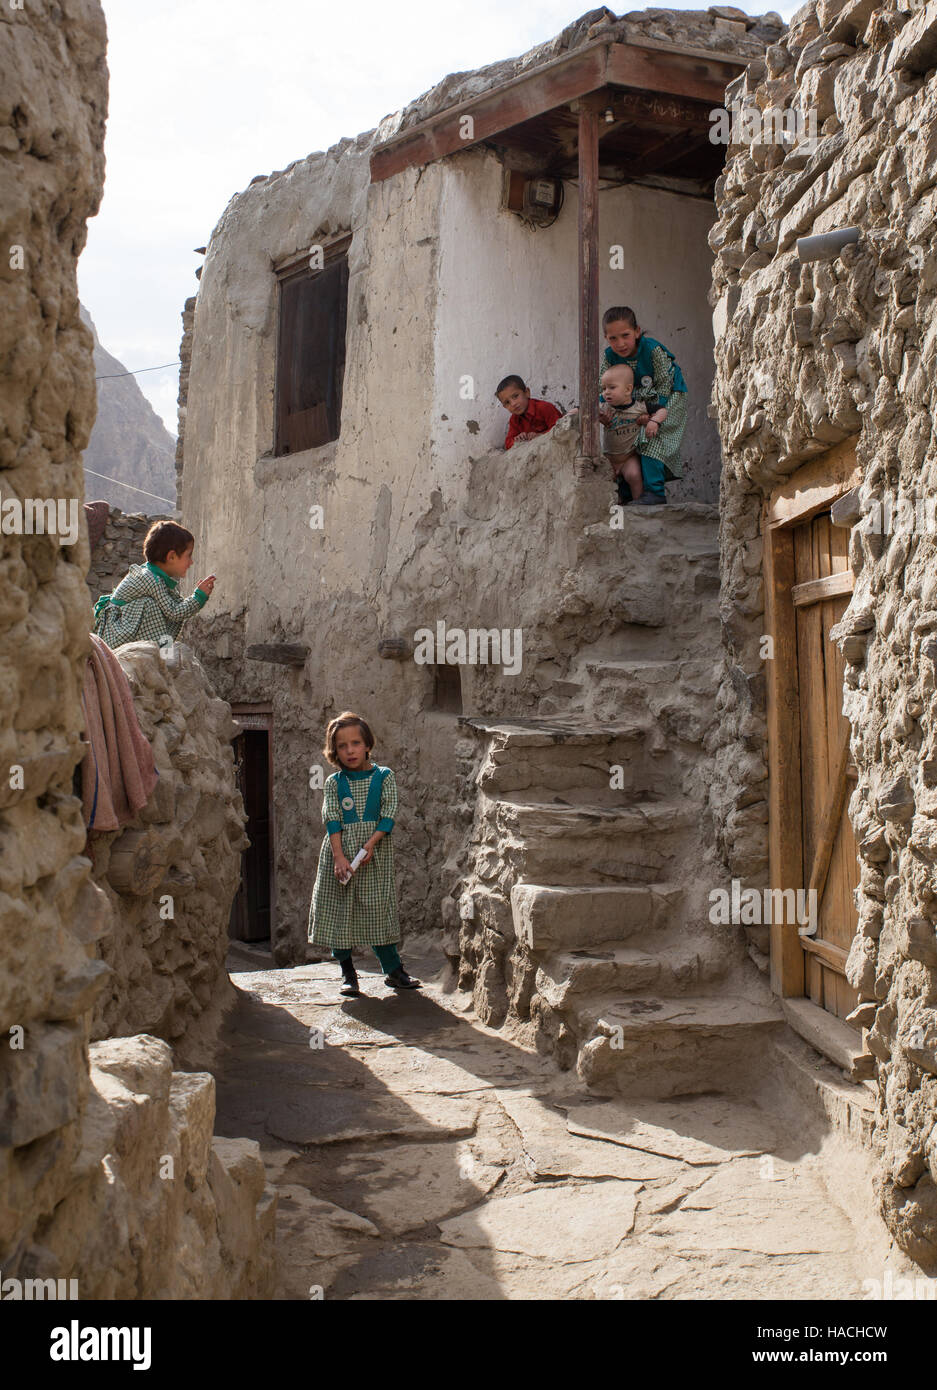 Muslim schoolgirls in school uniform, living in a traditional village is preparing to go to school - Stock Image